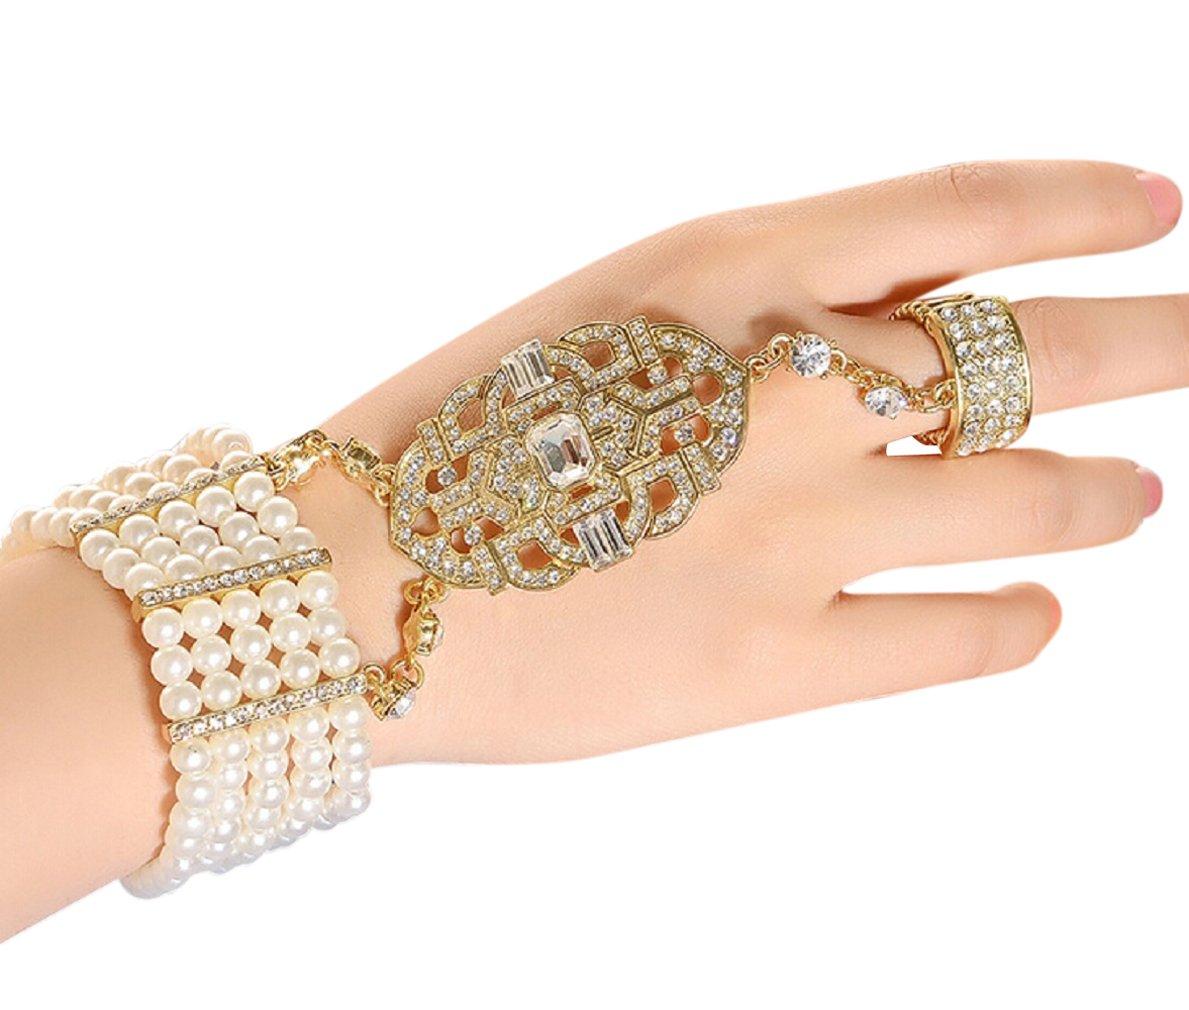 Zking Art Deco Movie Inspired Flower Pattern Simulated Pearl Bracelet Adjustable Ring Set (E-gold stone)